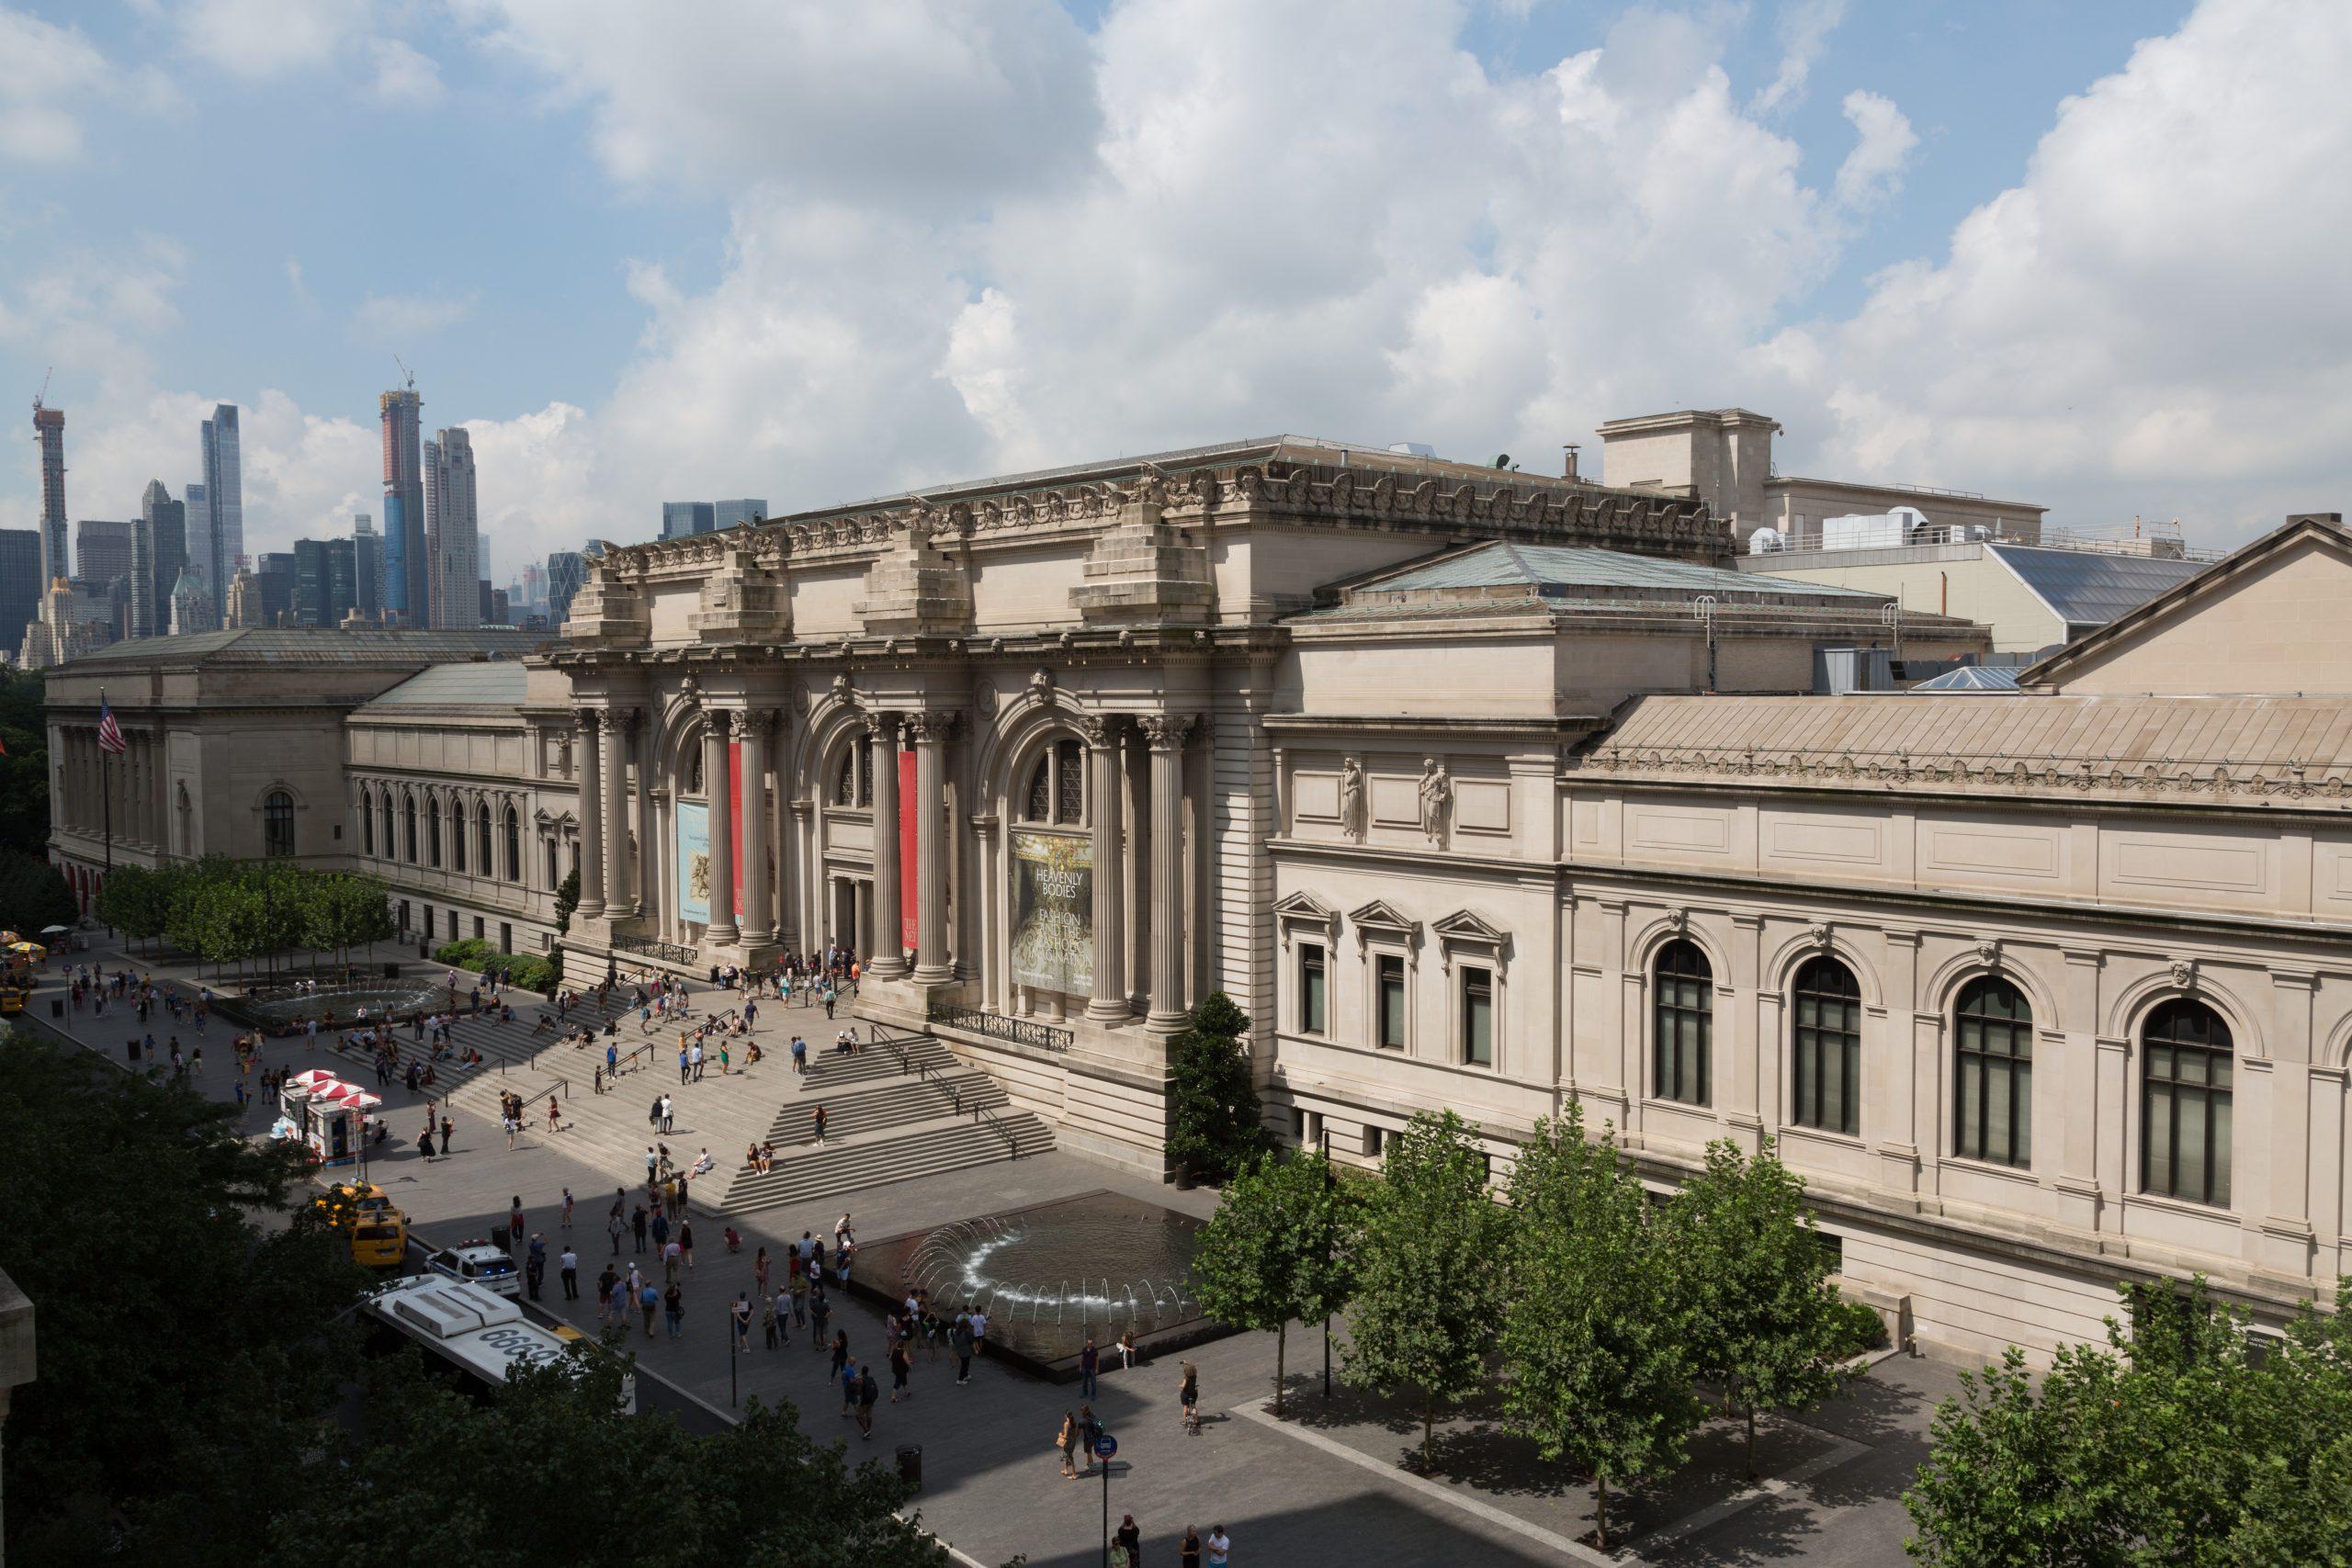 Exterior view of the Metropolitan Museum of Art